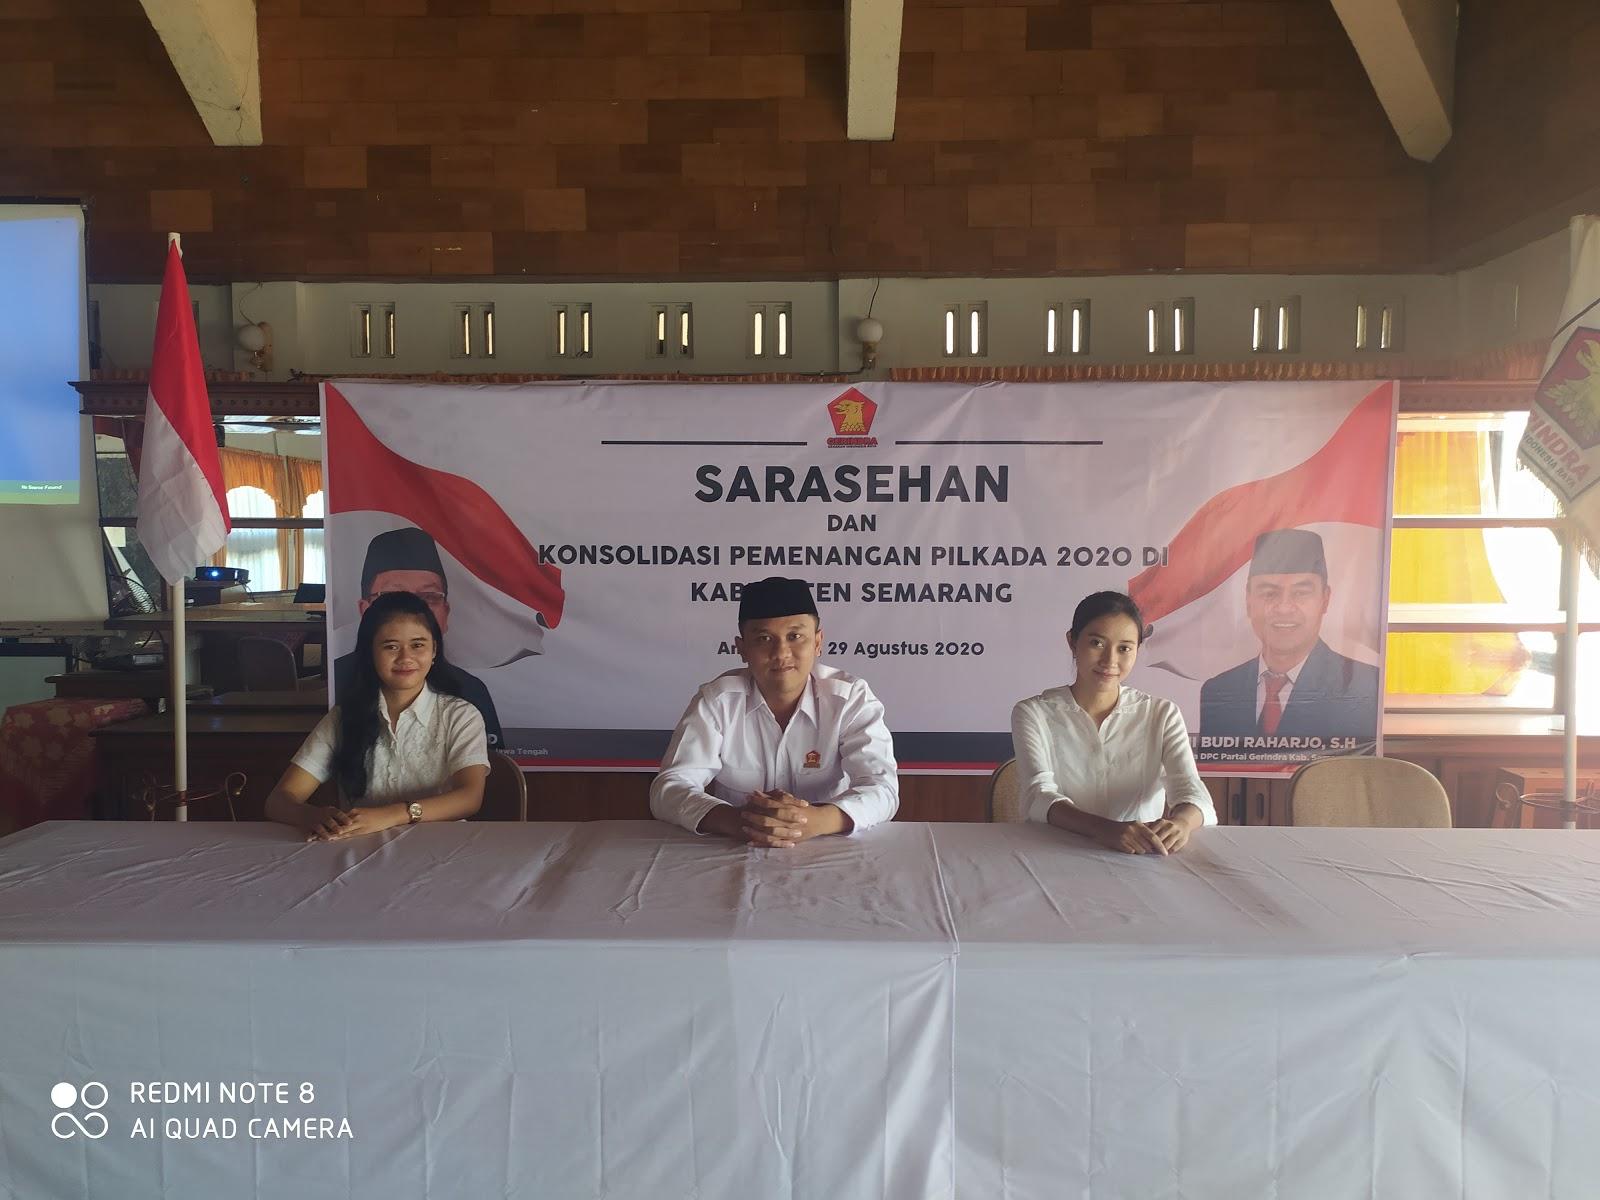 Ninda Anjelia Winanti Kartika Meyla Sari  Perempuan Indonesia Raya (PIRA) - Partai Gerindra Ambarawa